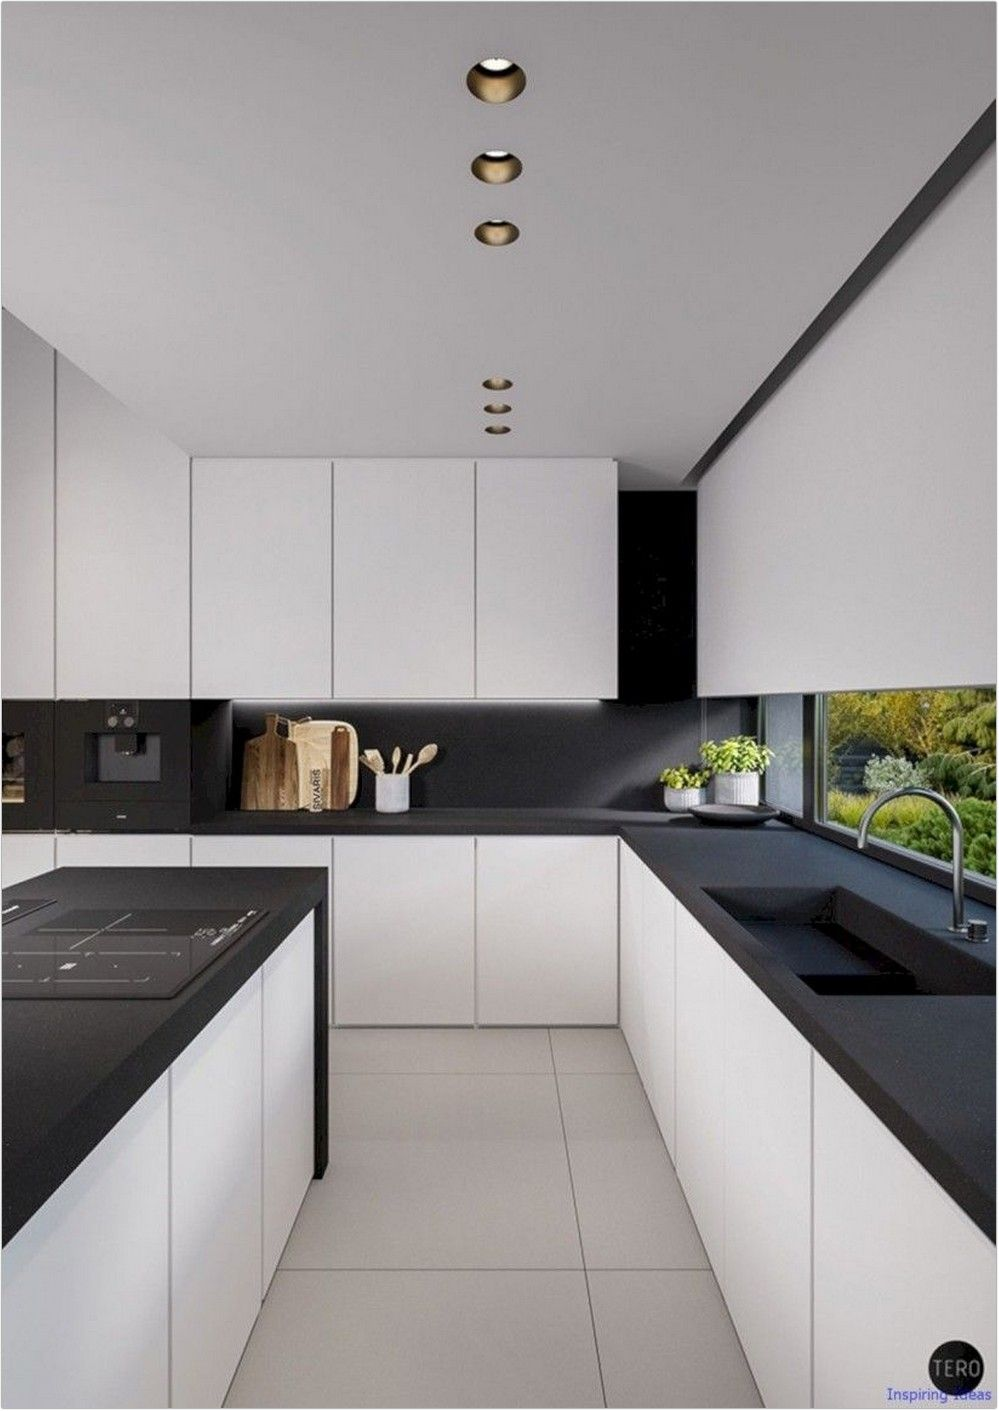 50 White Kitchen Cabinets Design Ideas The Latest Kitchen Designs Kitchen Cabinet Design Kitchen Design